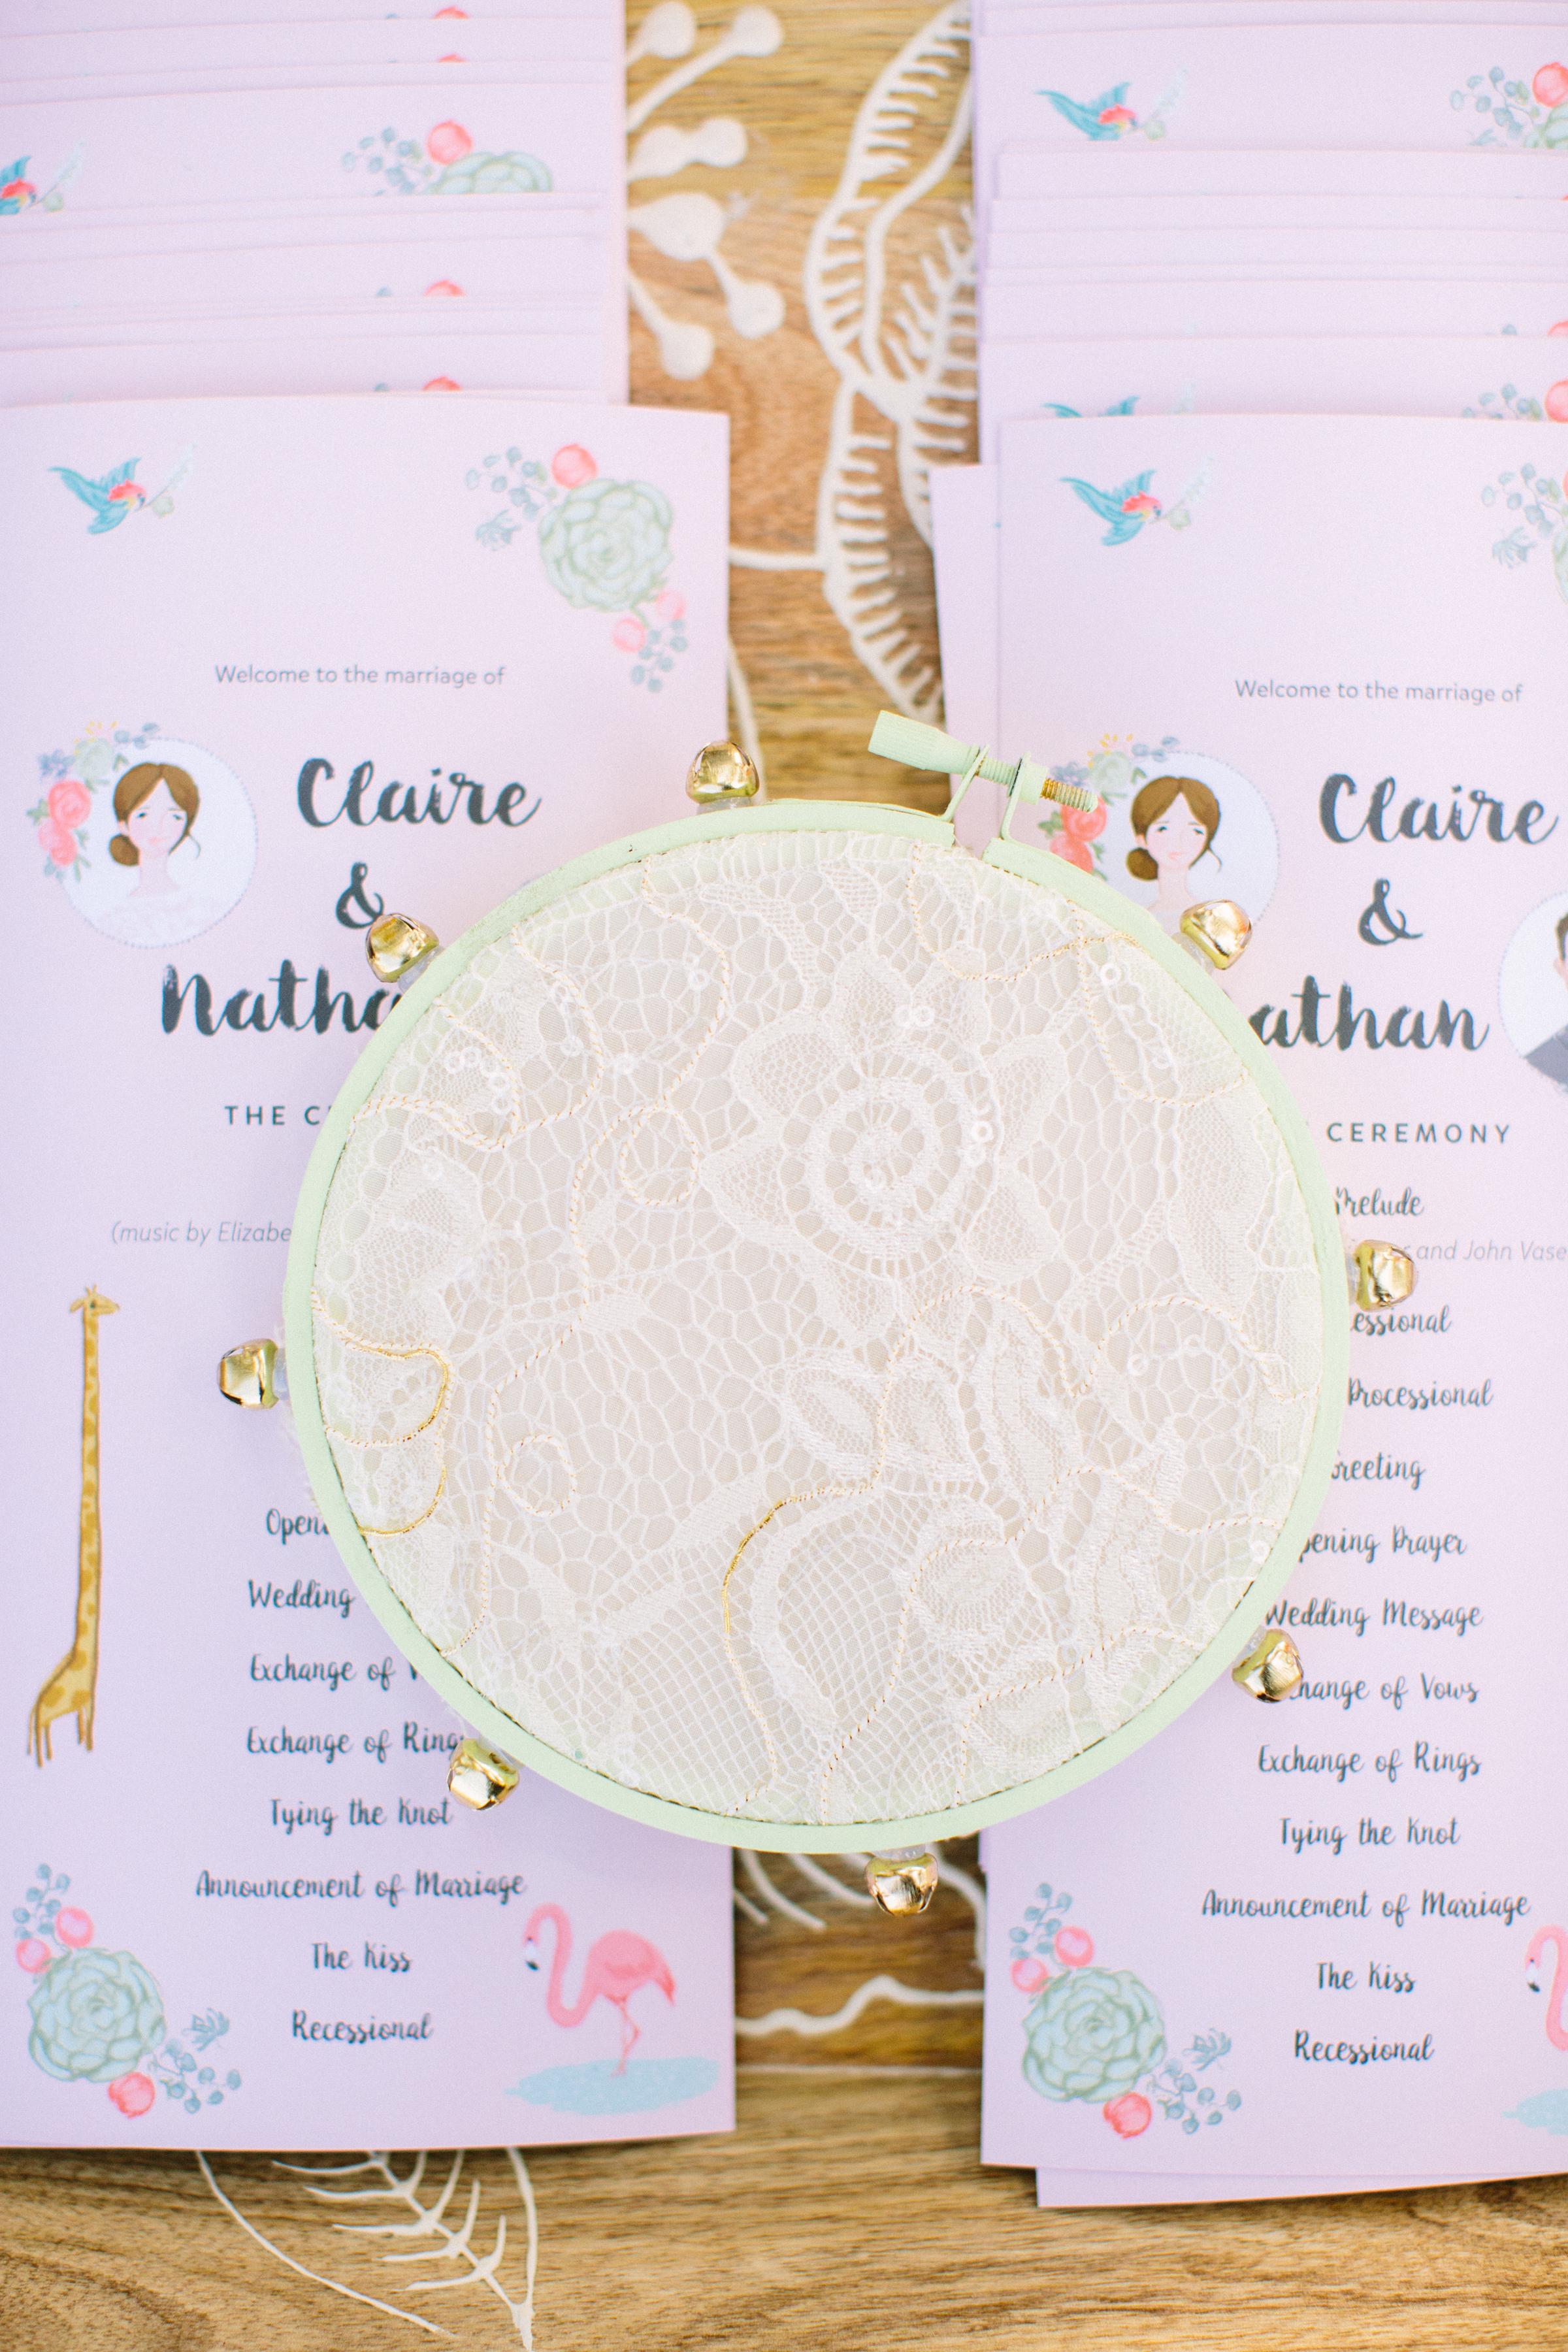 ClaireNathan_Ceremony-018.jpg